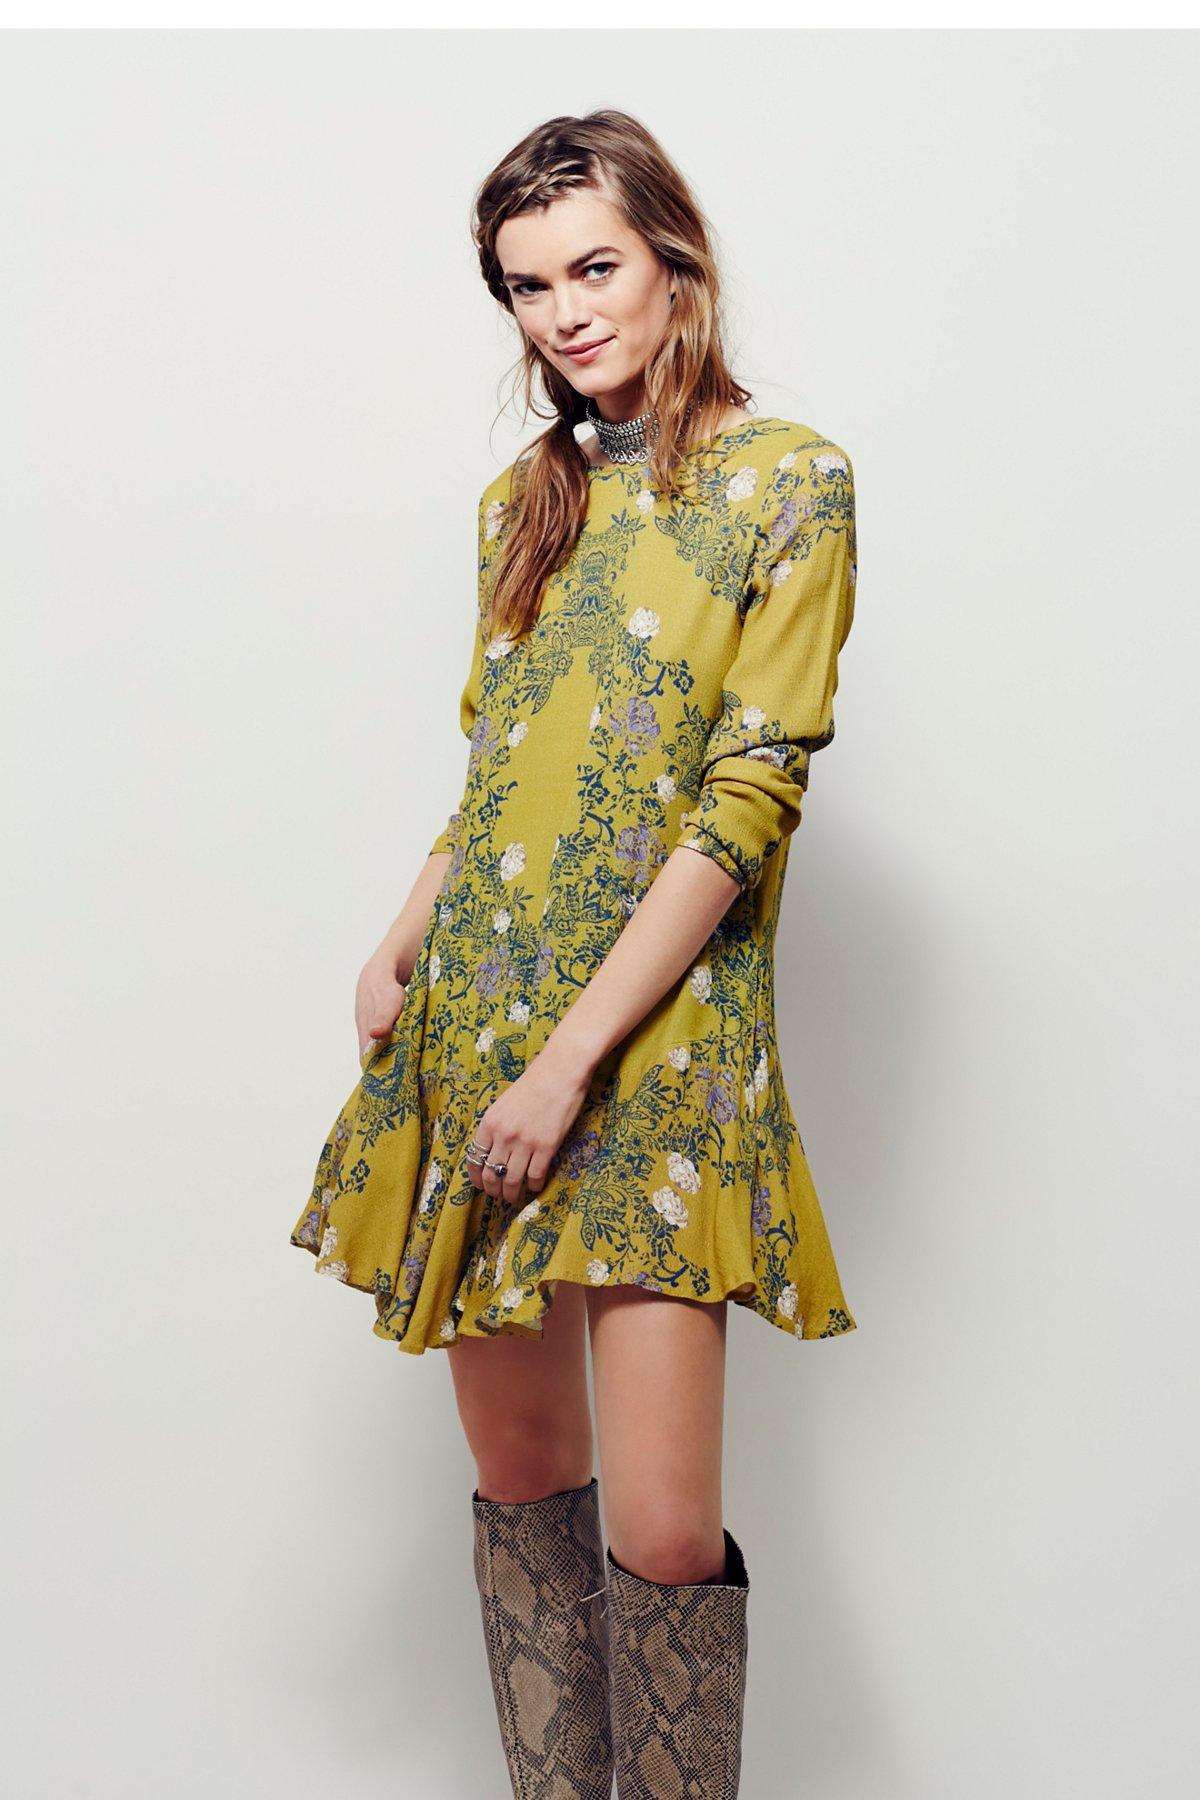 Smooth Talker花卉印花裙衫